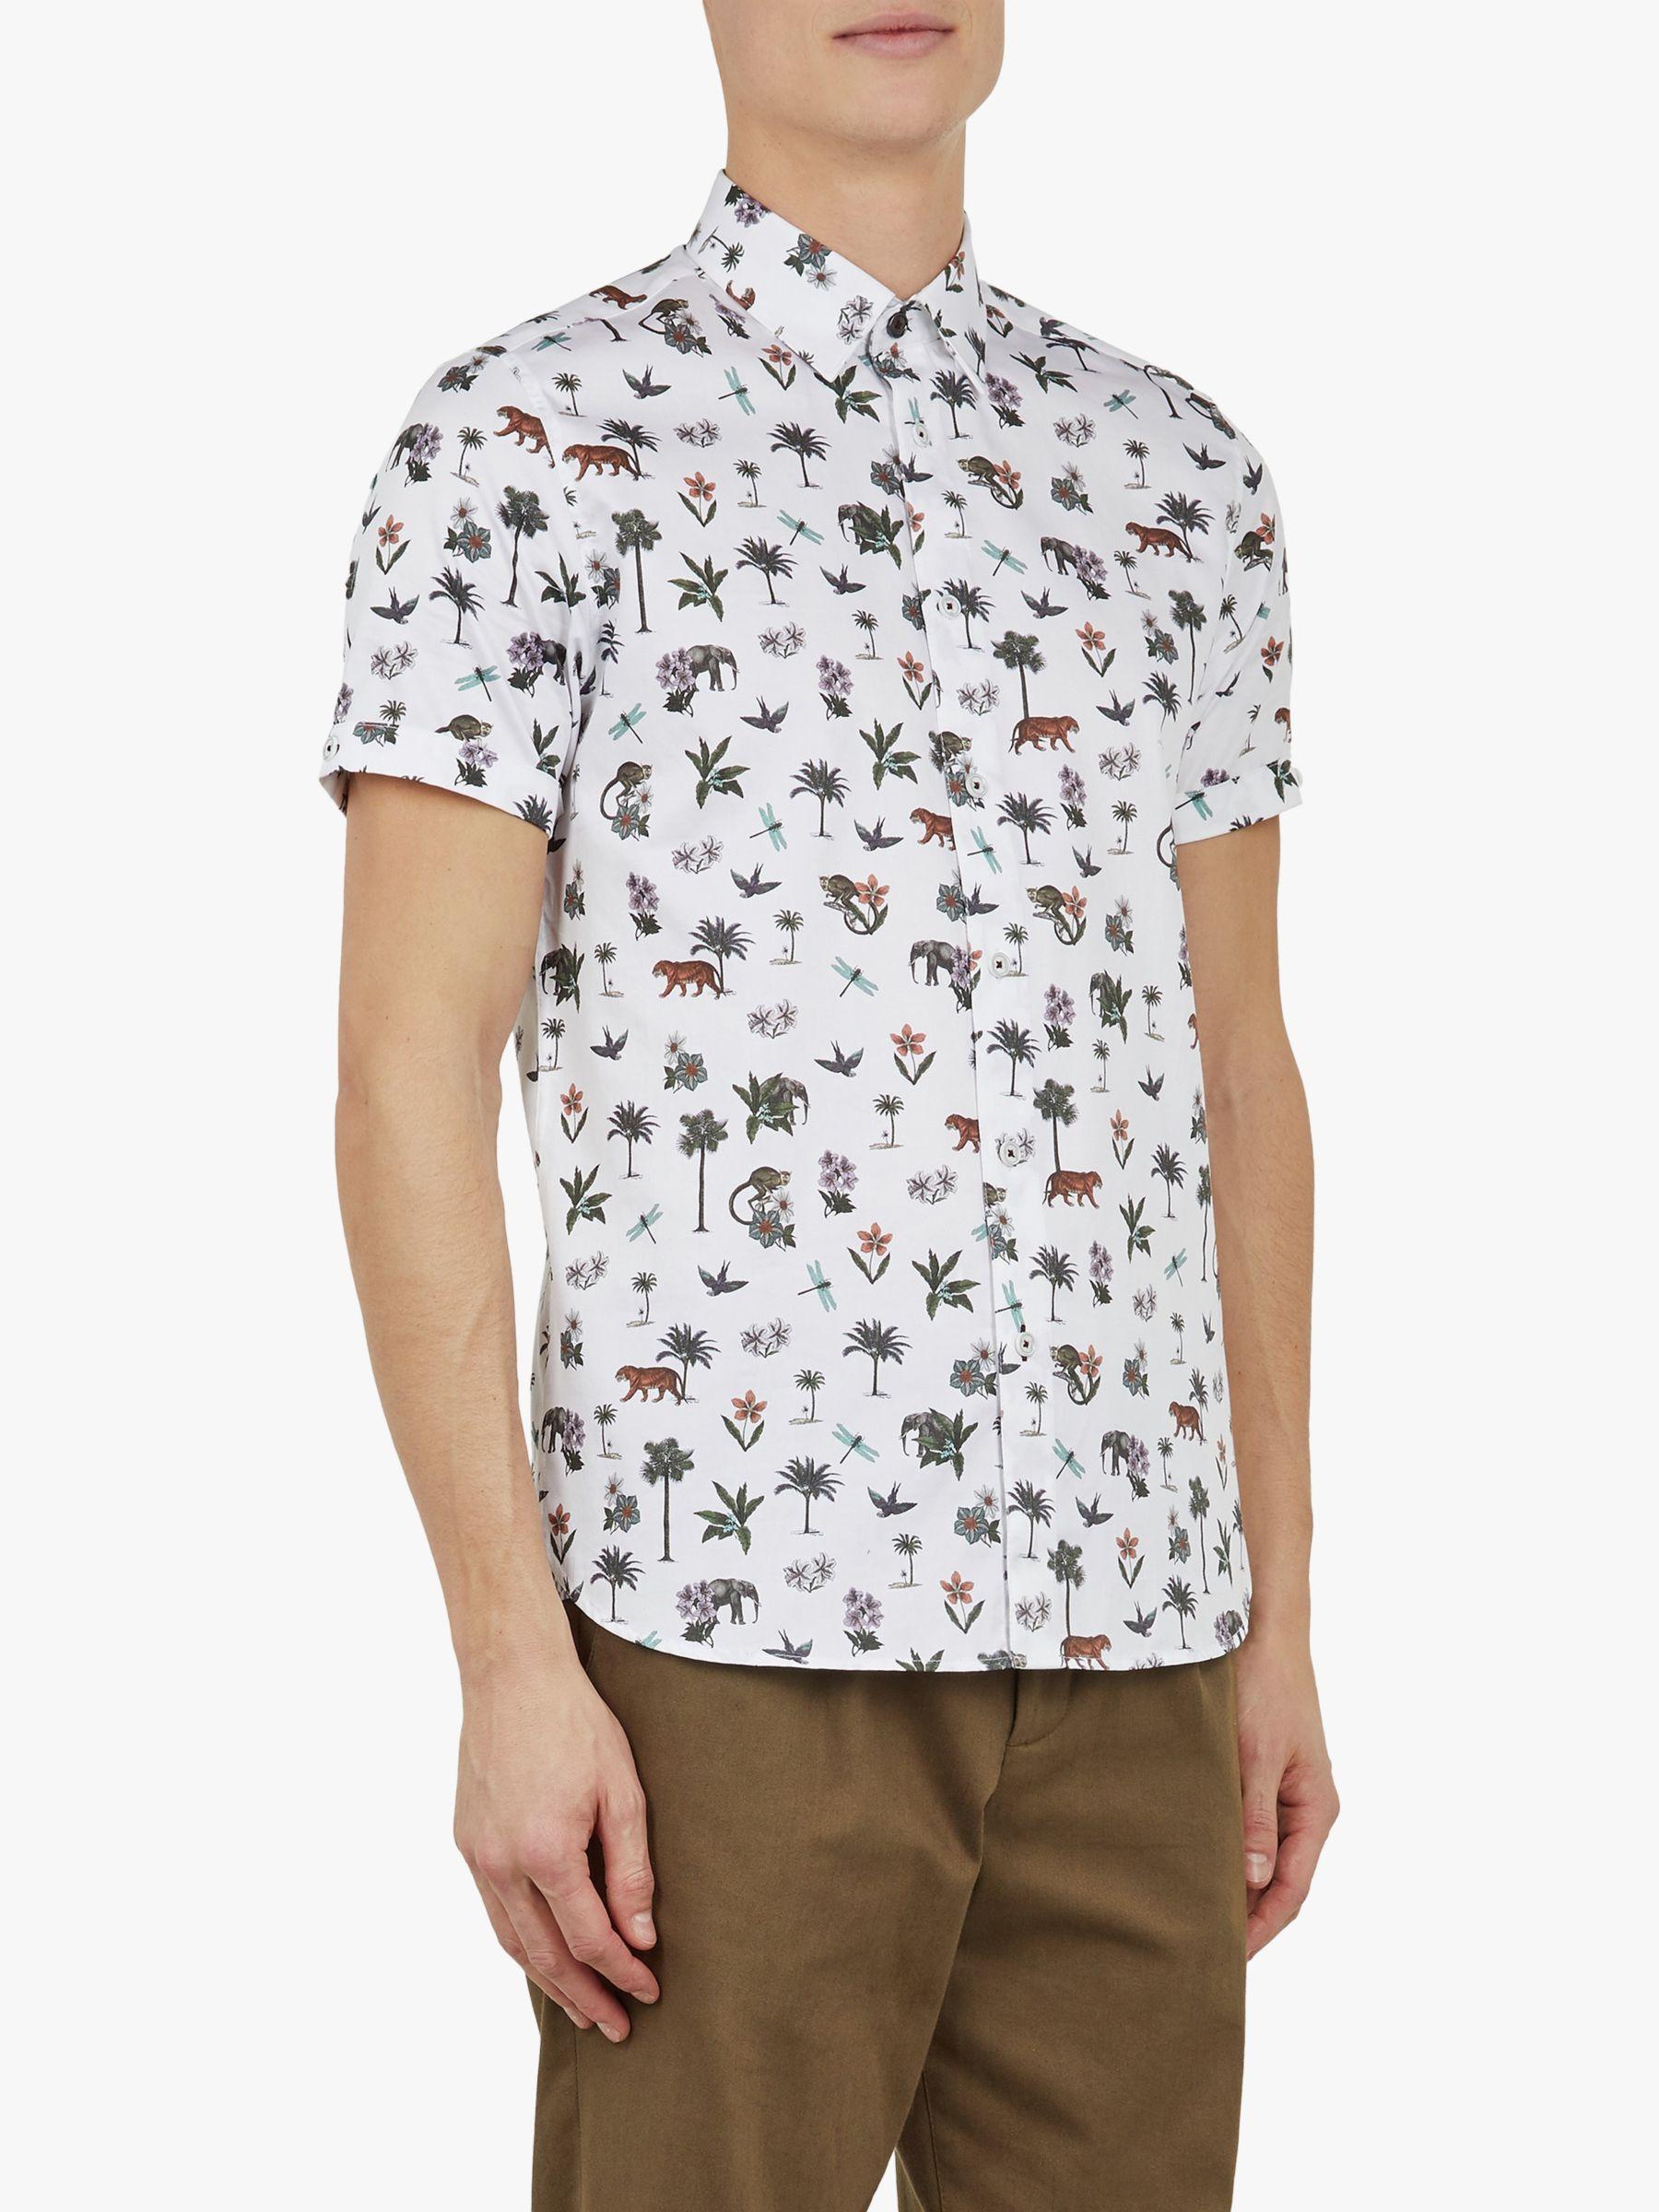 06670a4f400d Ted Baker Dolfin Jungle Print Shirt in White for Men - Lyst